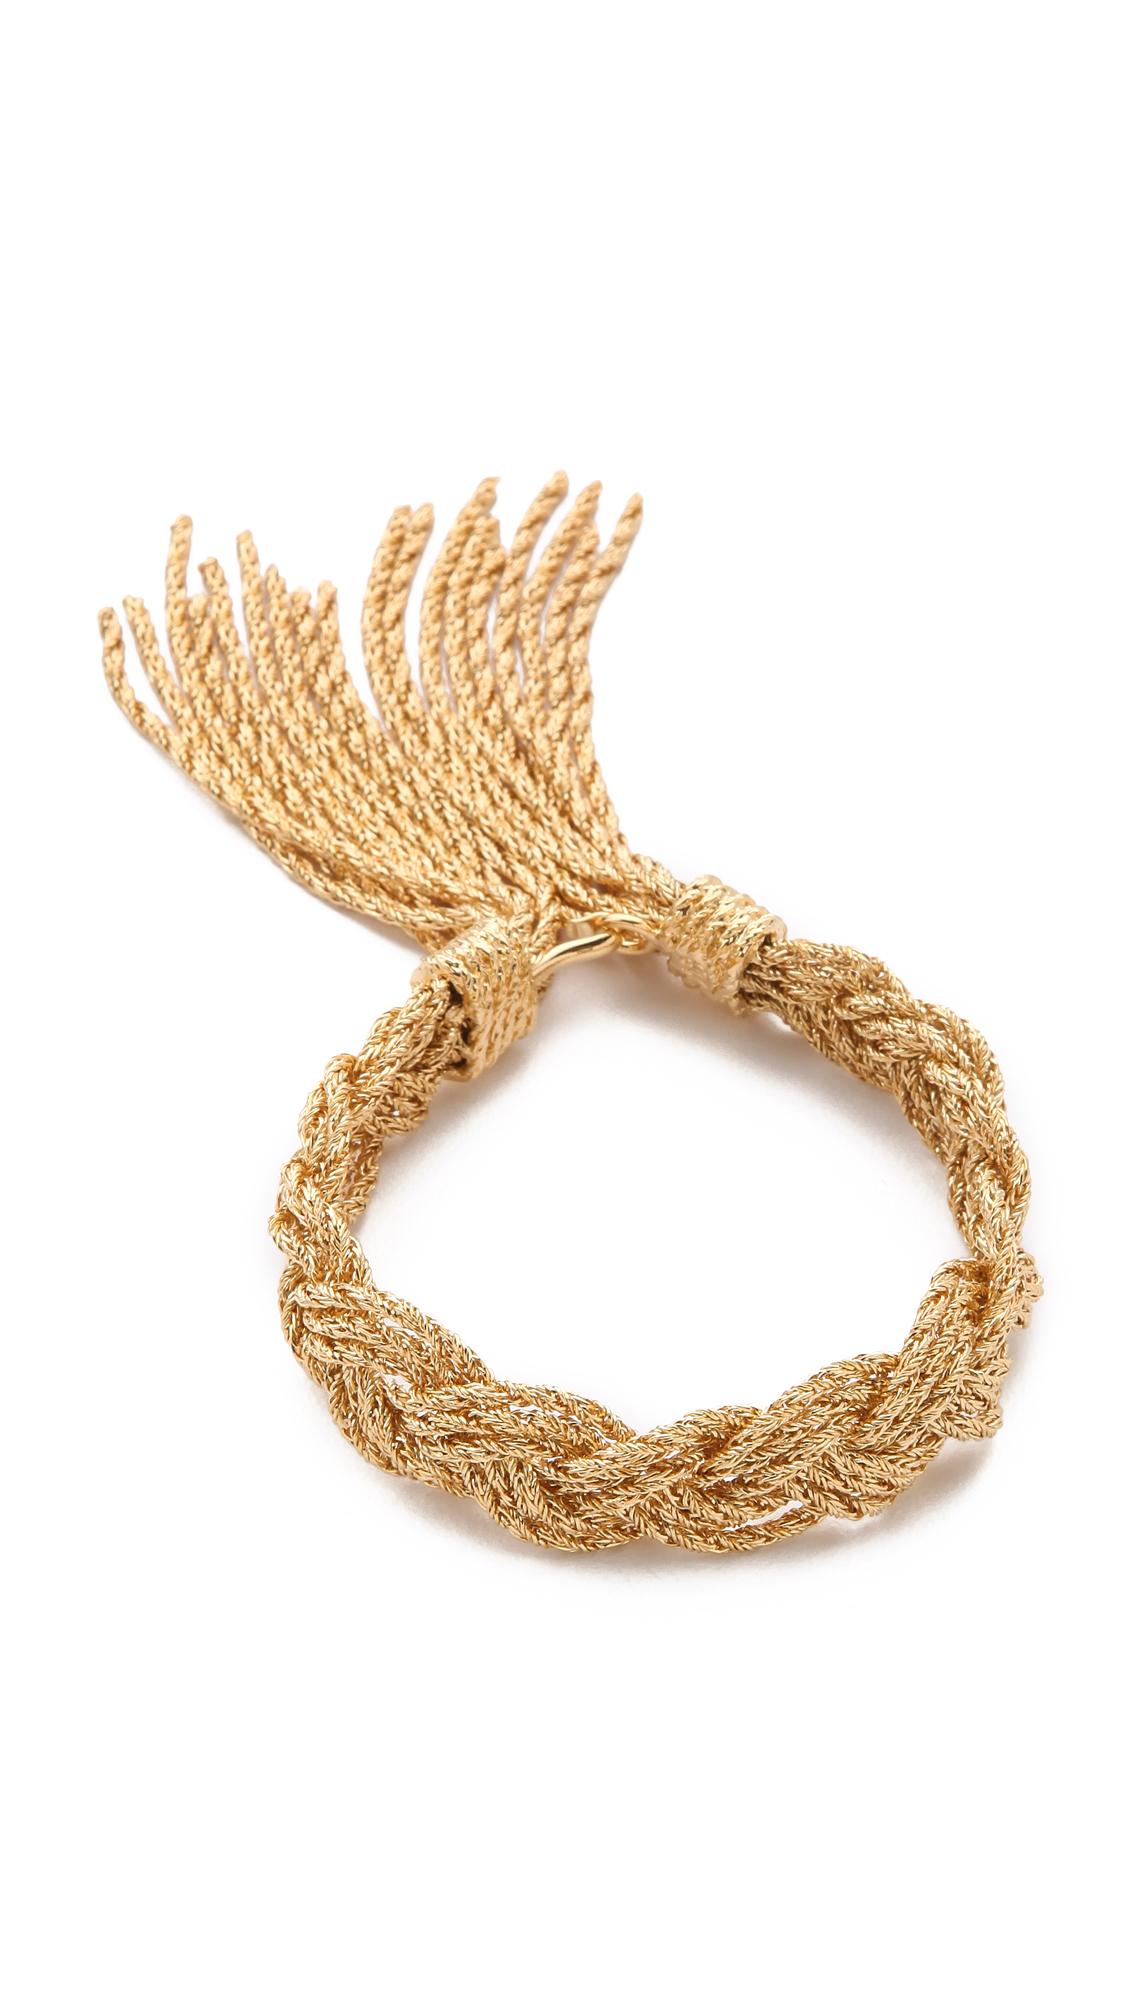 rope bracelet - Metallic Aur 3ND1pj